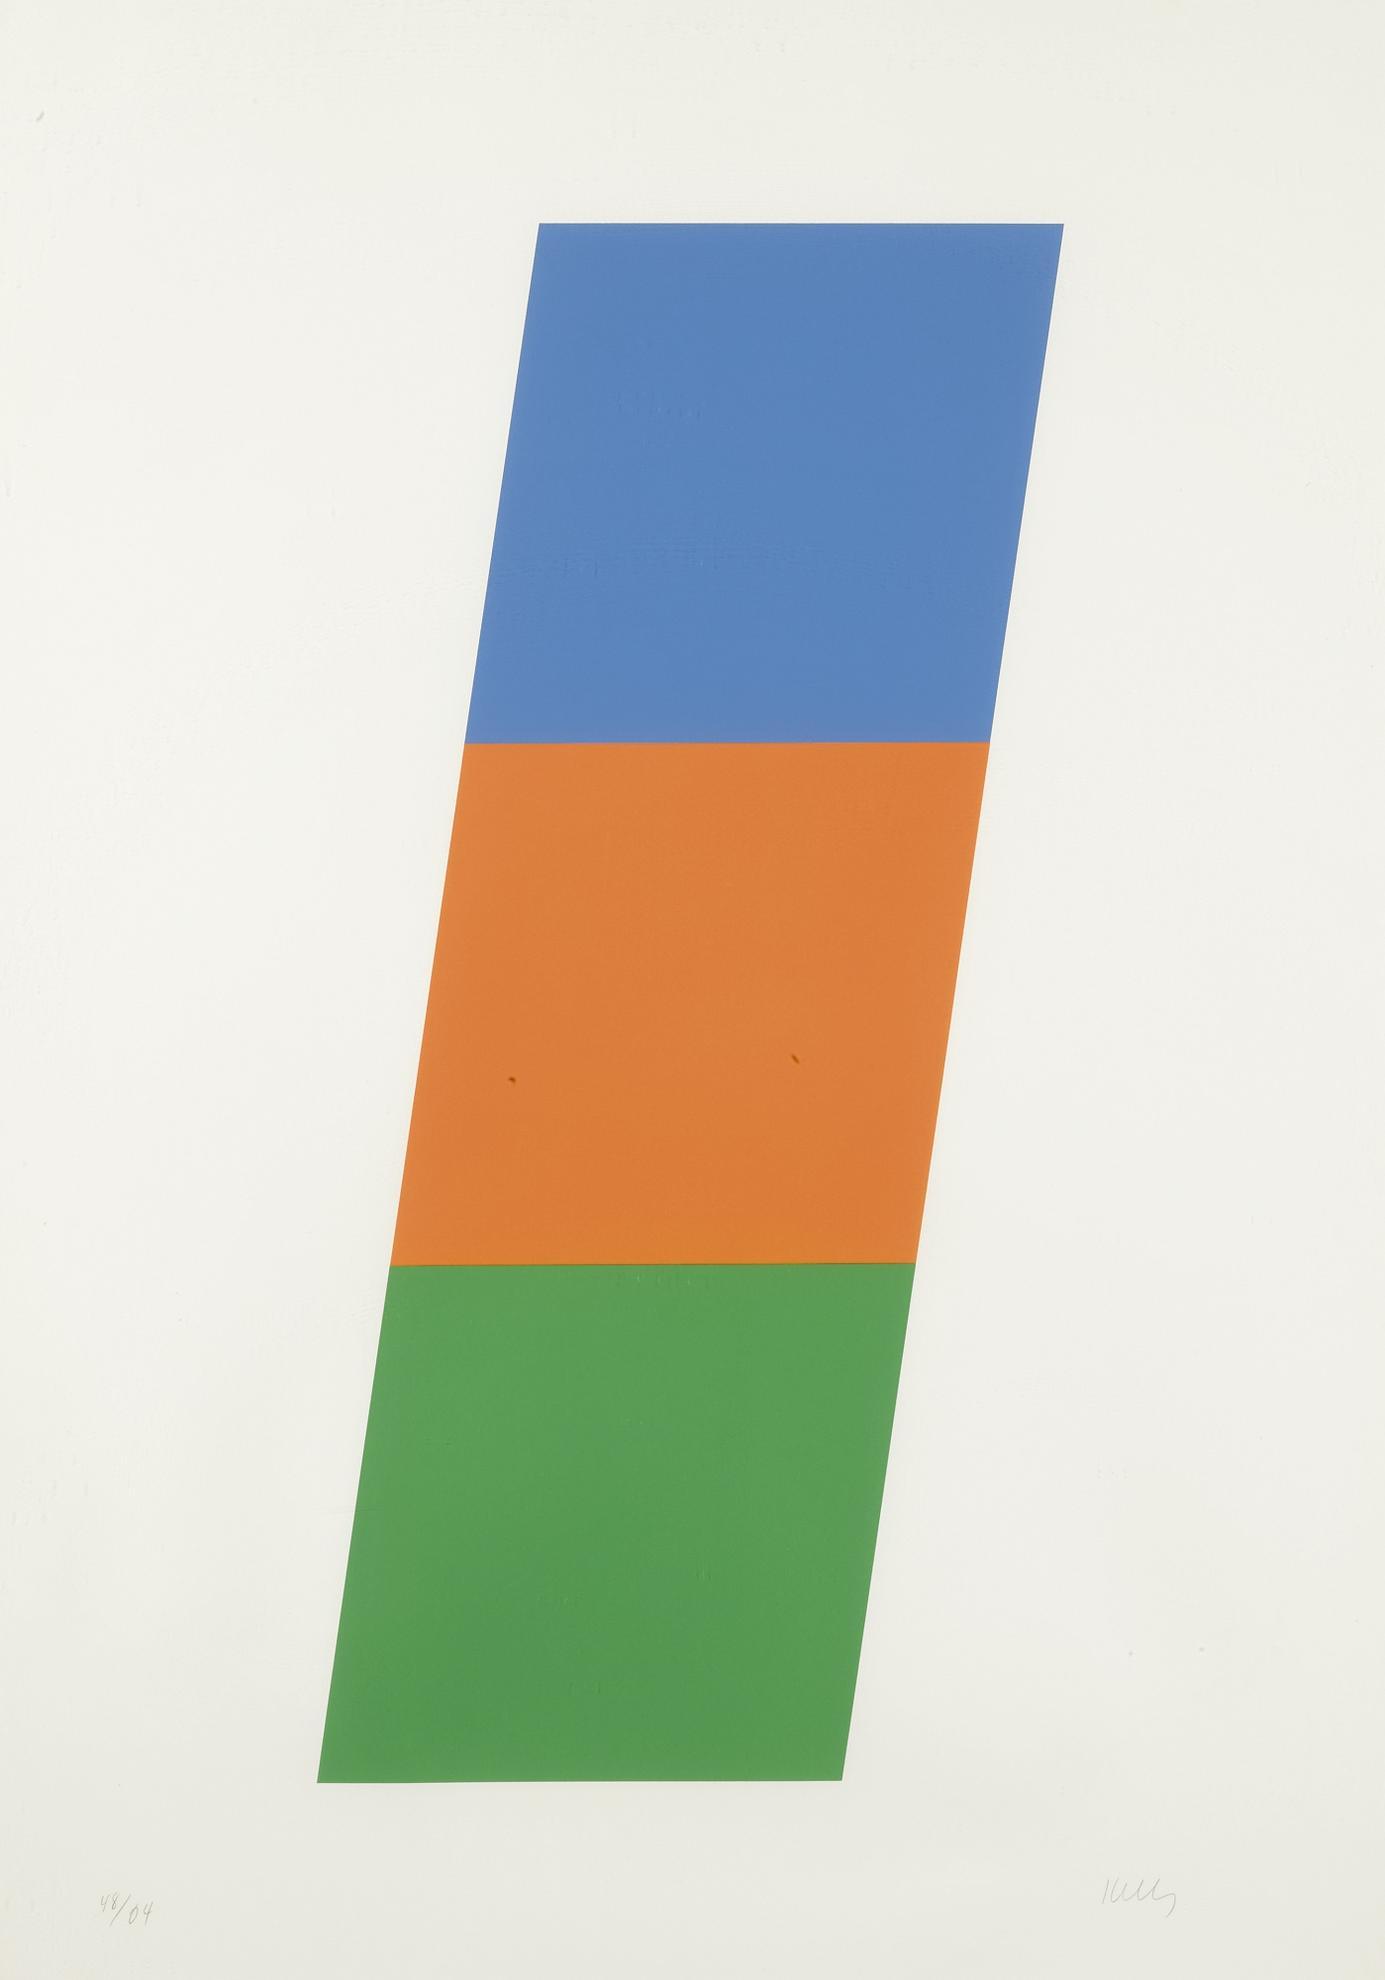 Ellsworth Kelly-Blue Red-Orange Green (Axsom 75)-1971